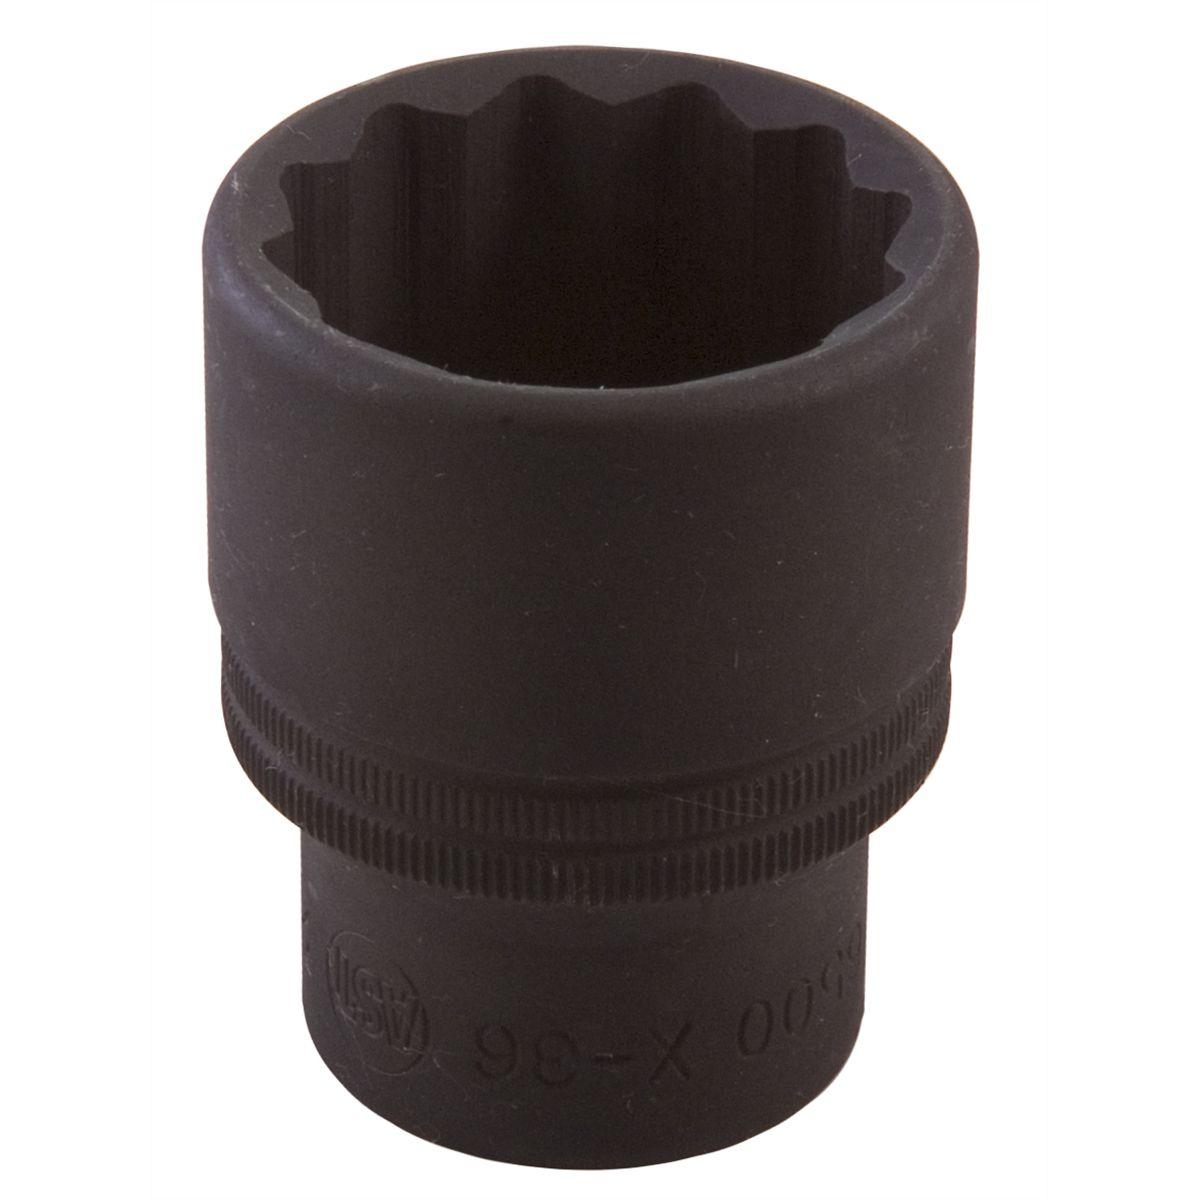 Assenmacher 6500X-36 3/4 In Dr 12-Pt Impact Socket - 36mm